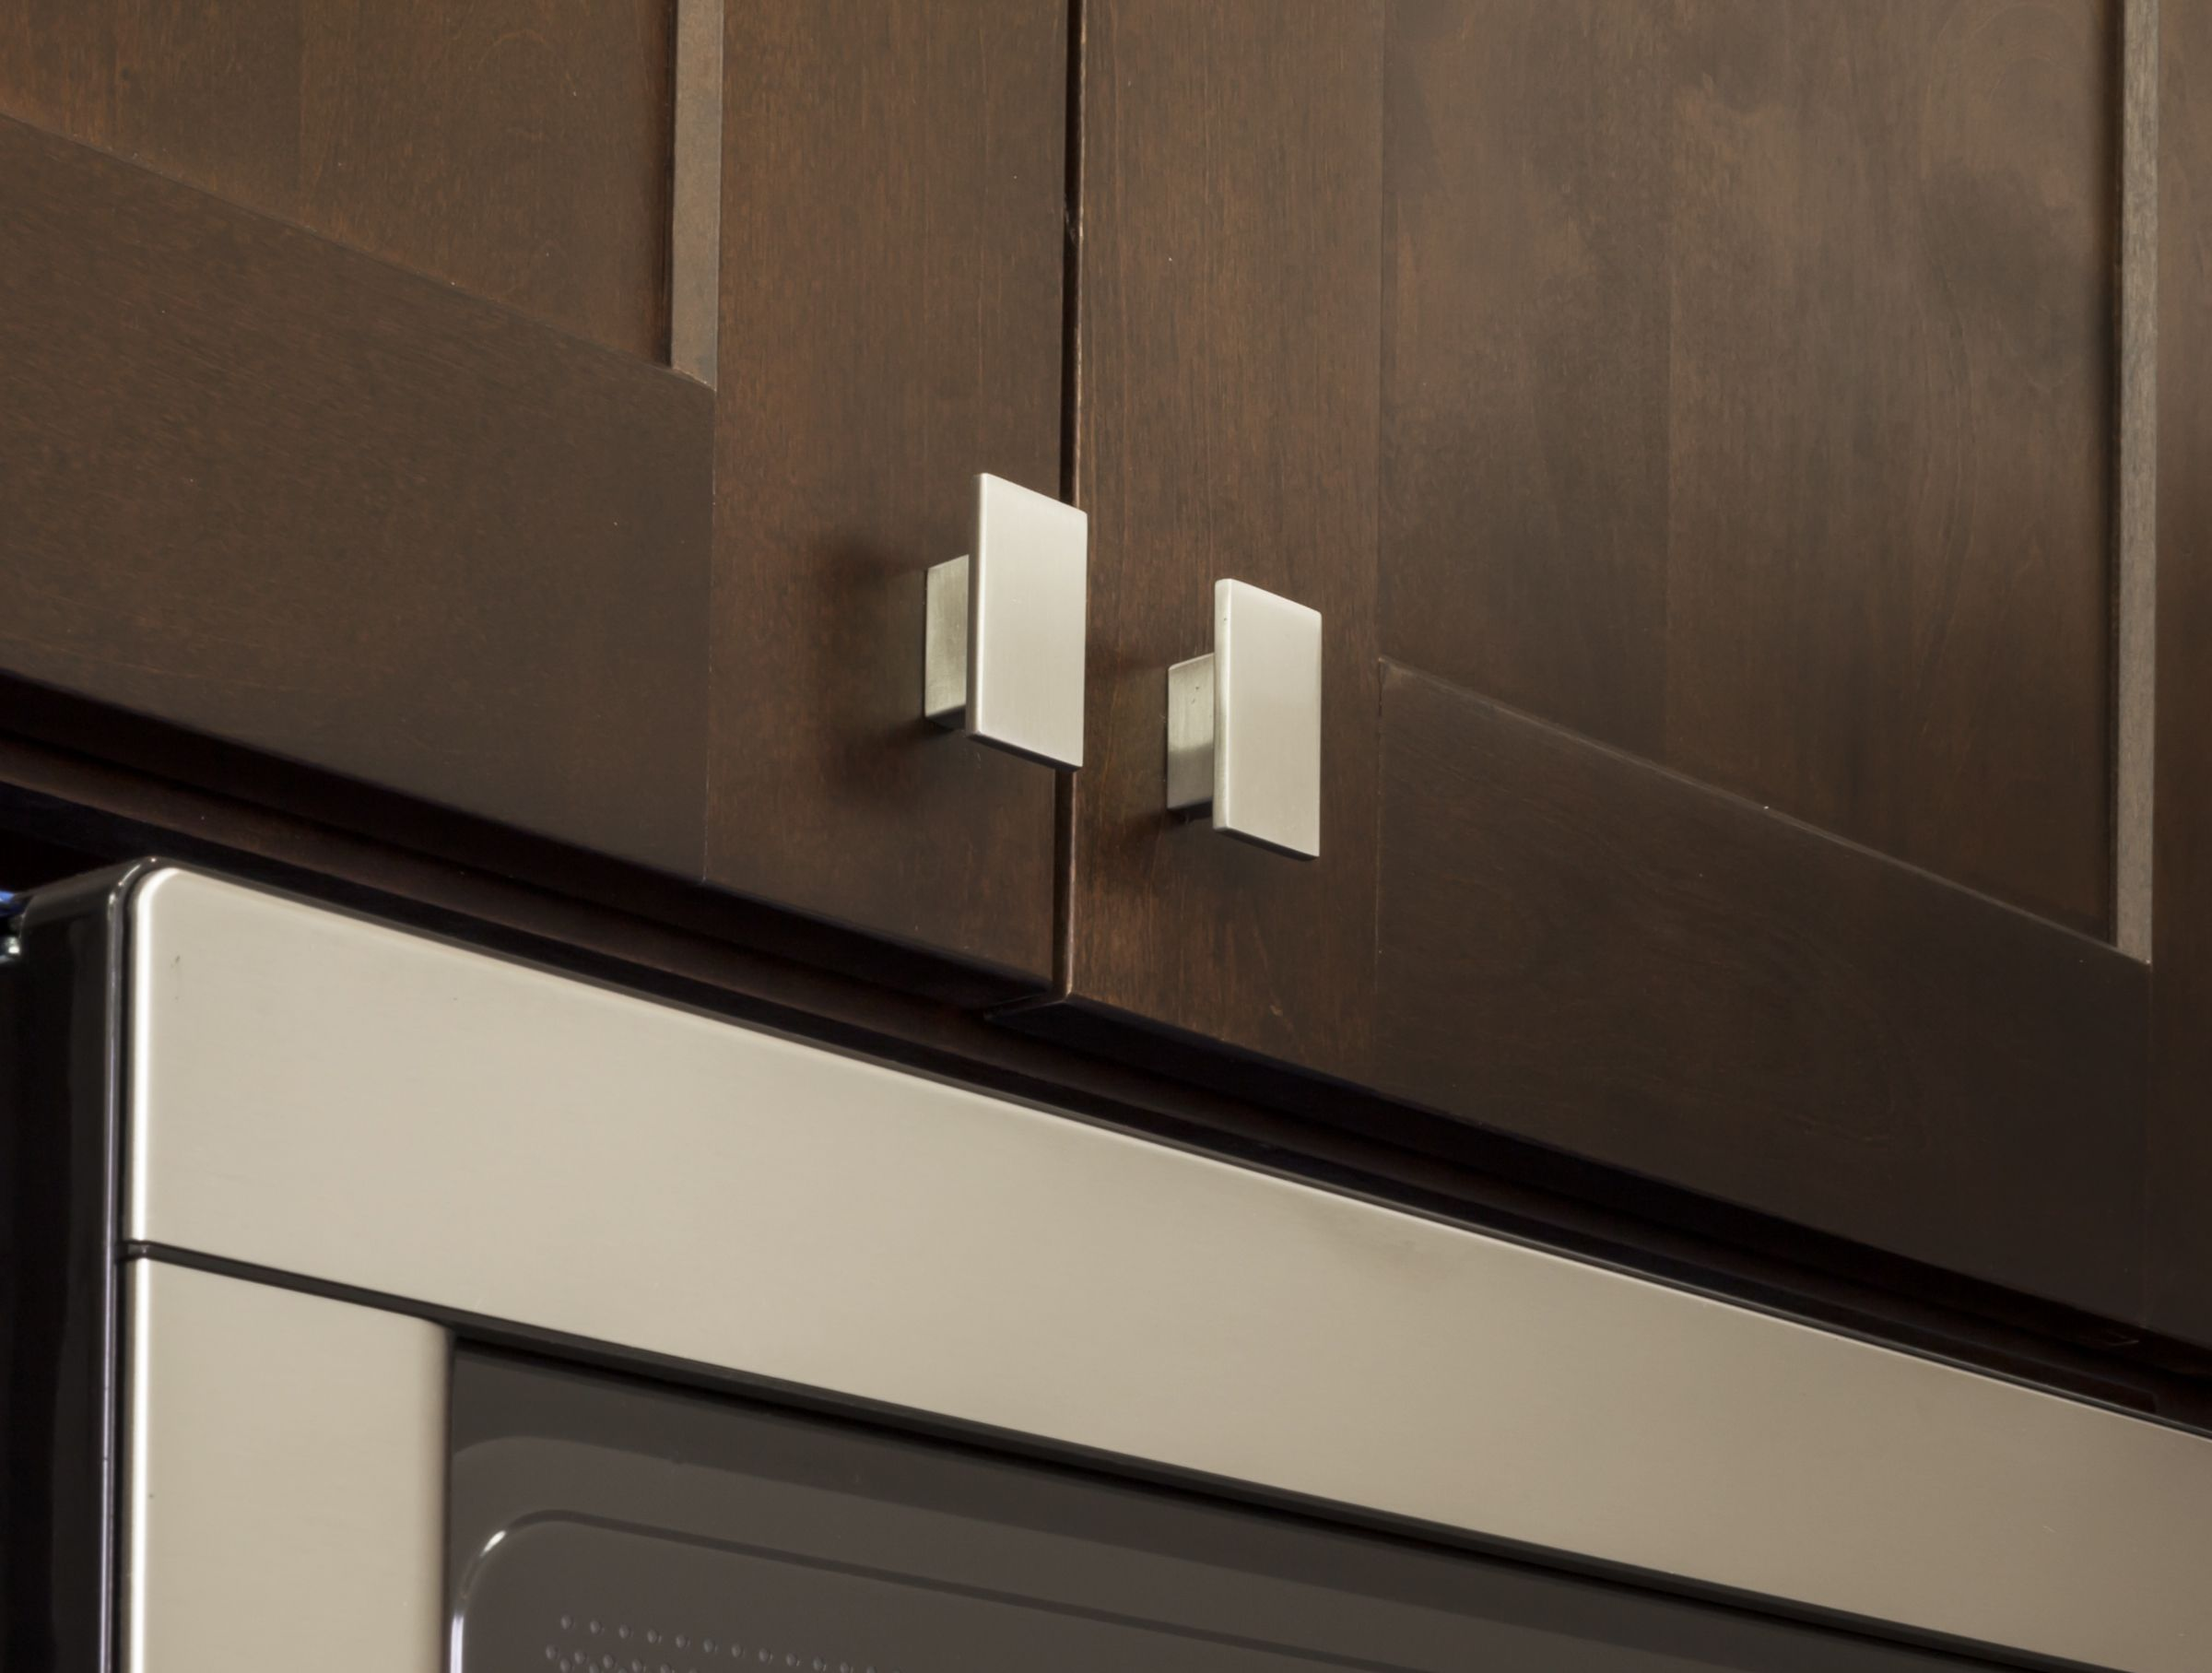 Mirada cabinet knob by Jeffrey Alexander by Hardware Resources ...